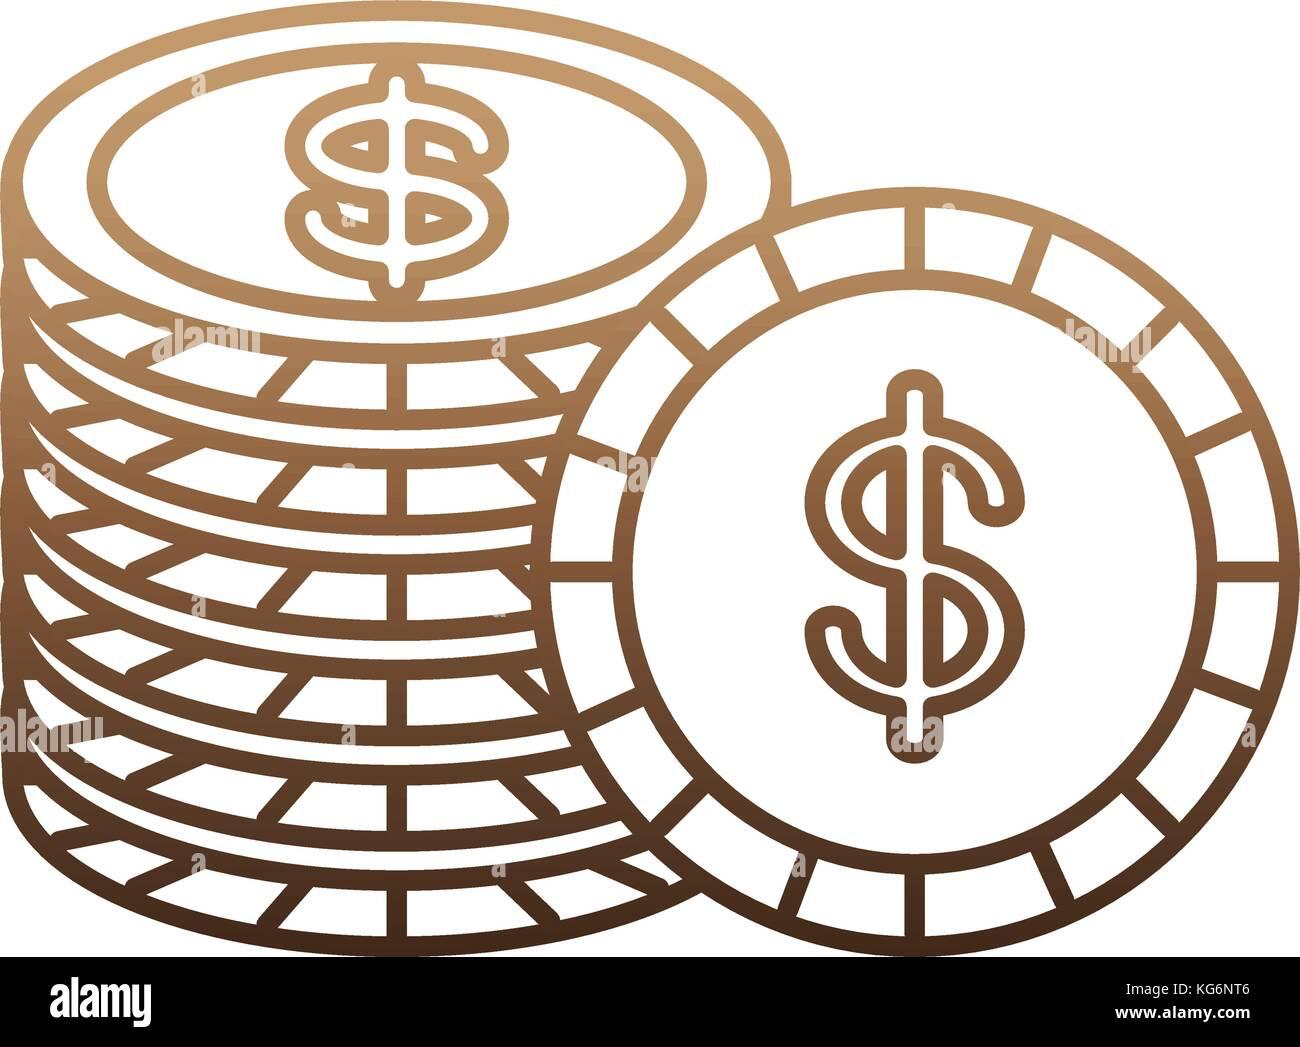 money coins design - Stock Image